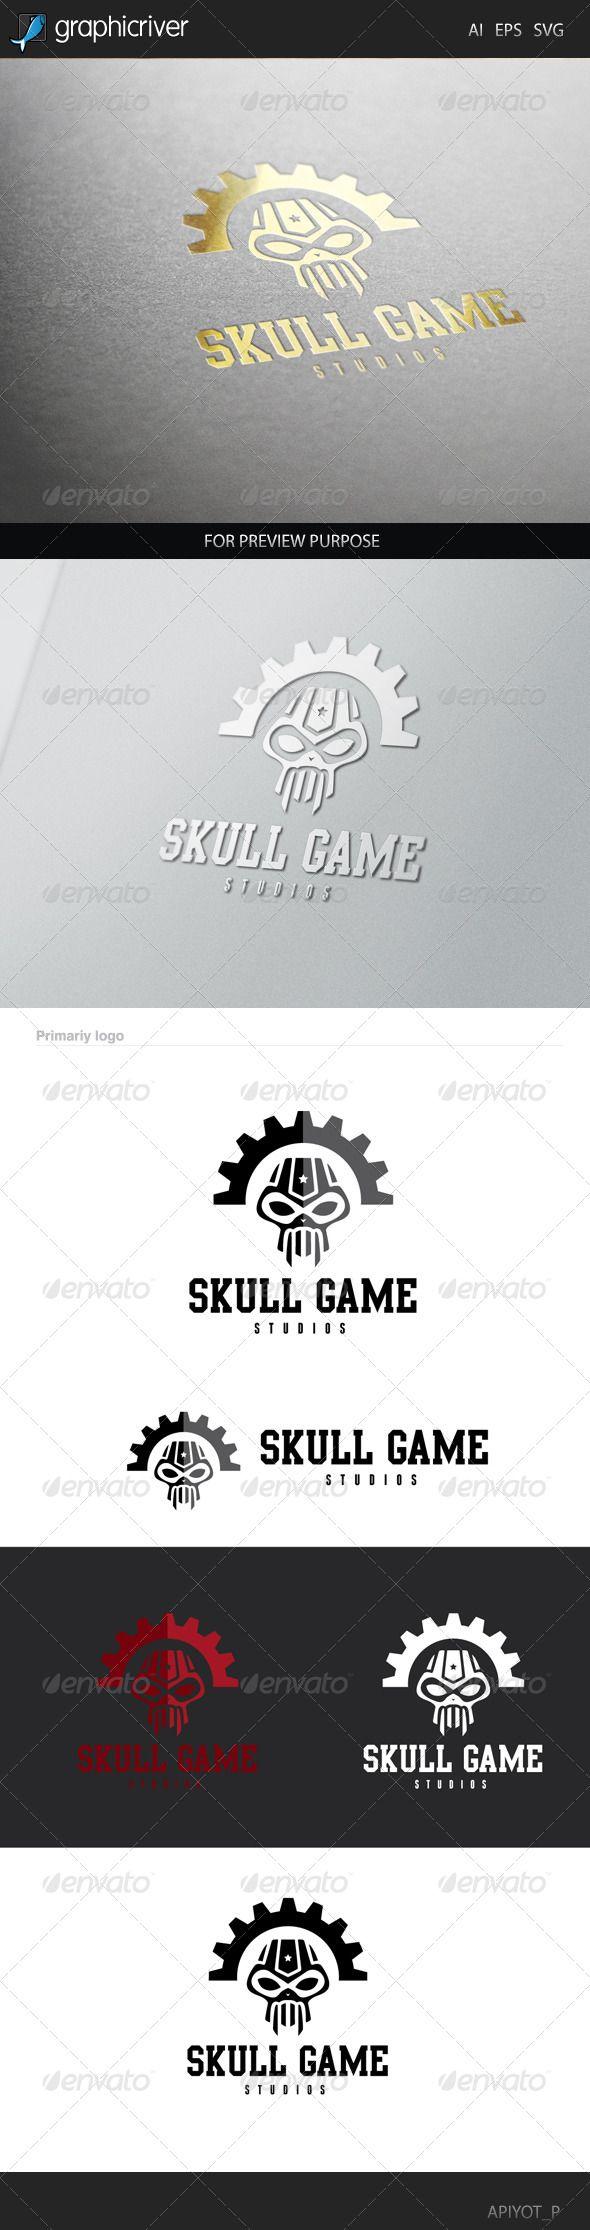 Skull Game - Logo Design Template Vector #logotype Download it here: http://graphicriver.net/item/skull-game-logo/8505926?s_rank=1073?ref=nesto